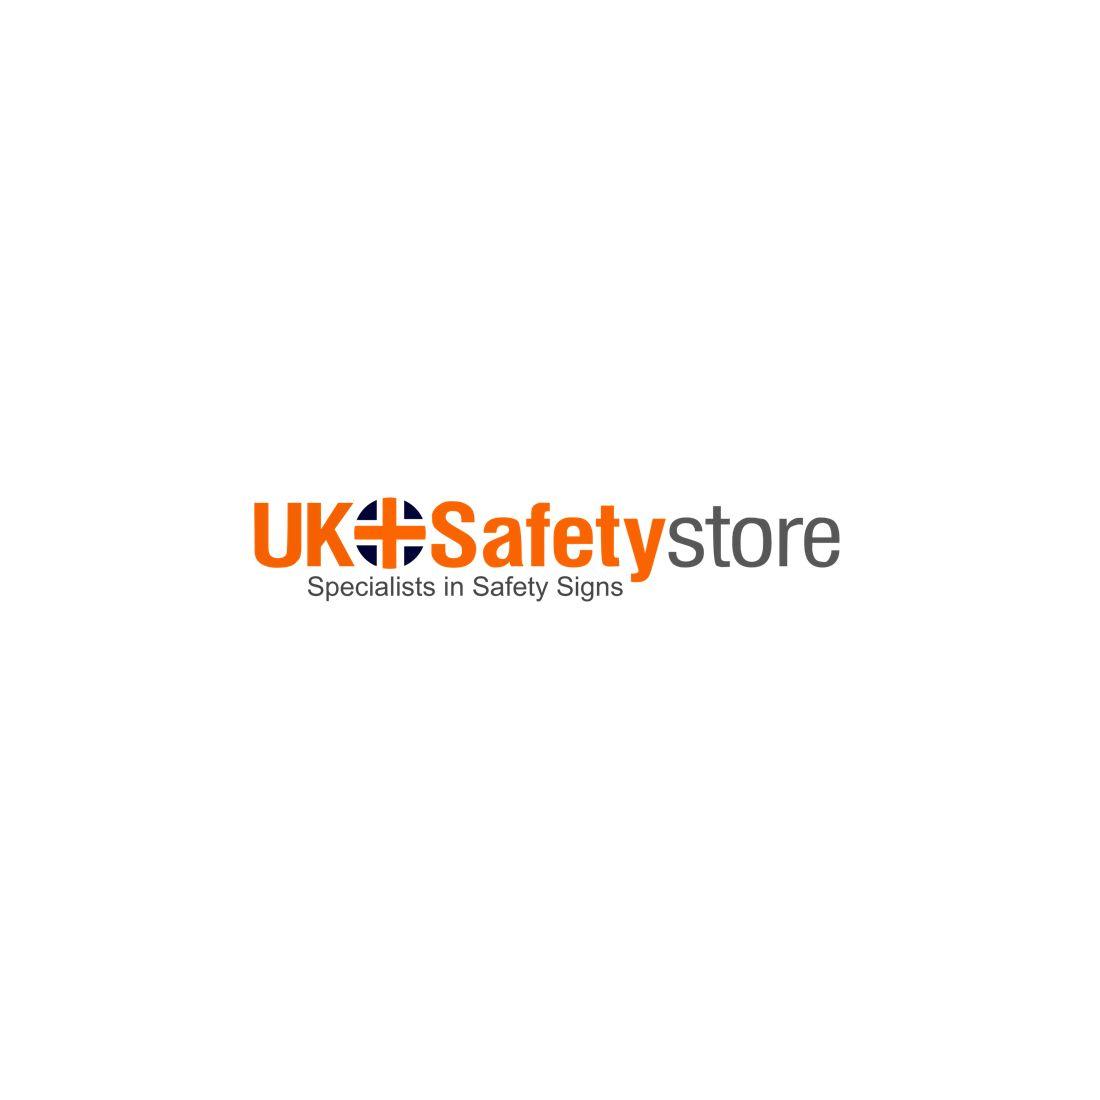 Medium Risk Assesment for Vibrating Construction Equipment Self Adhesive Sticker 50W X 50Hmm